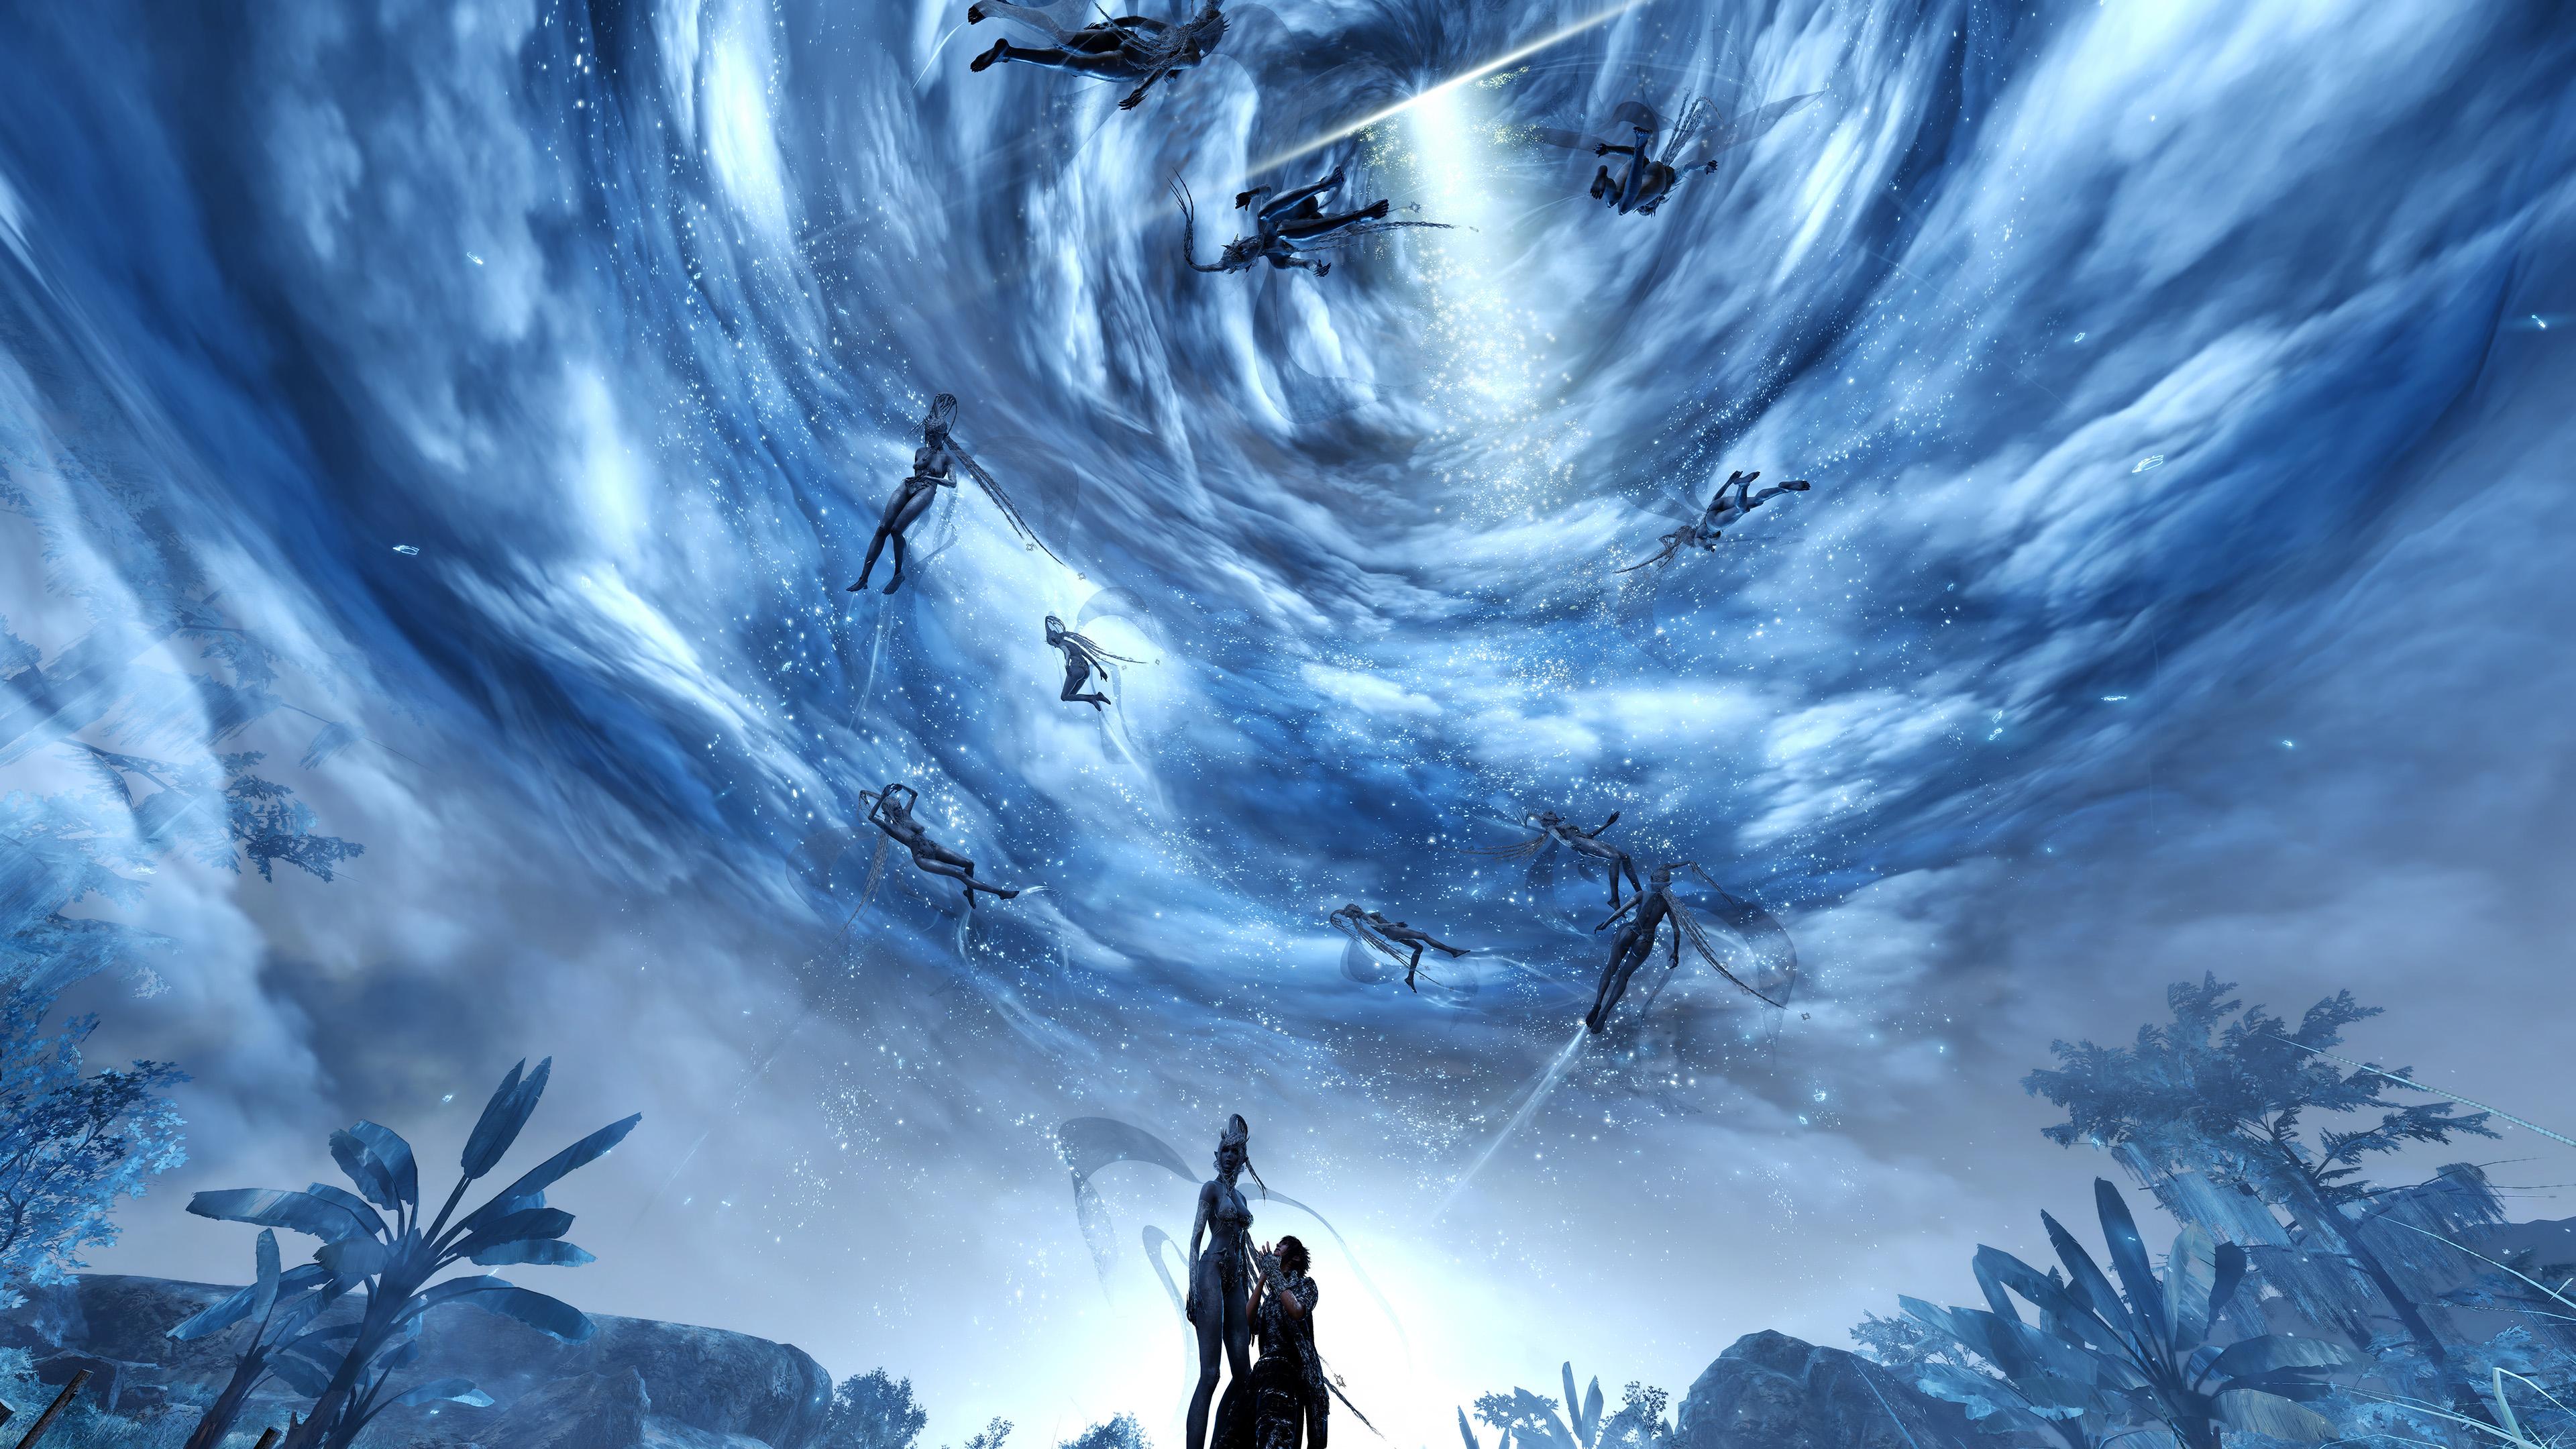 Final Fantasy Backgrounds Wallpaper Cave